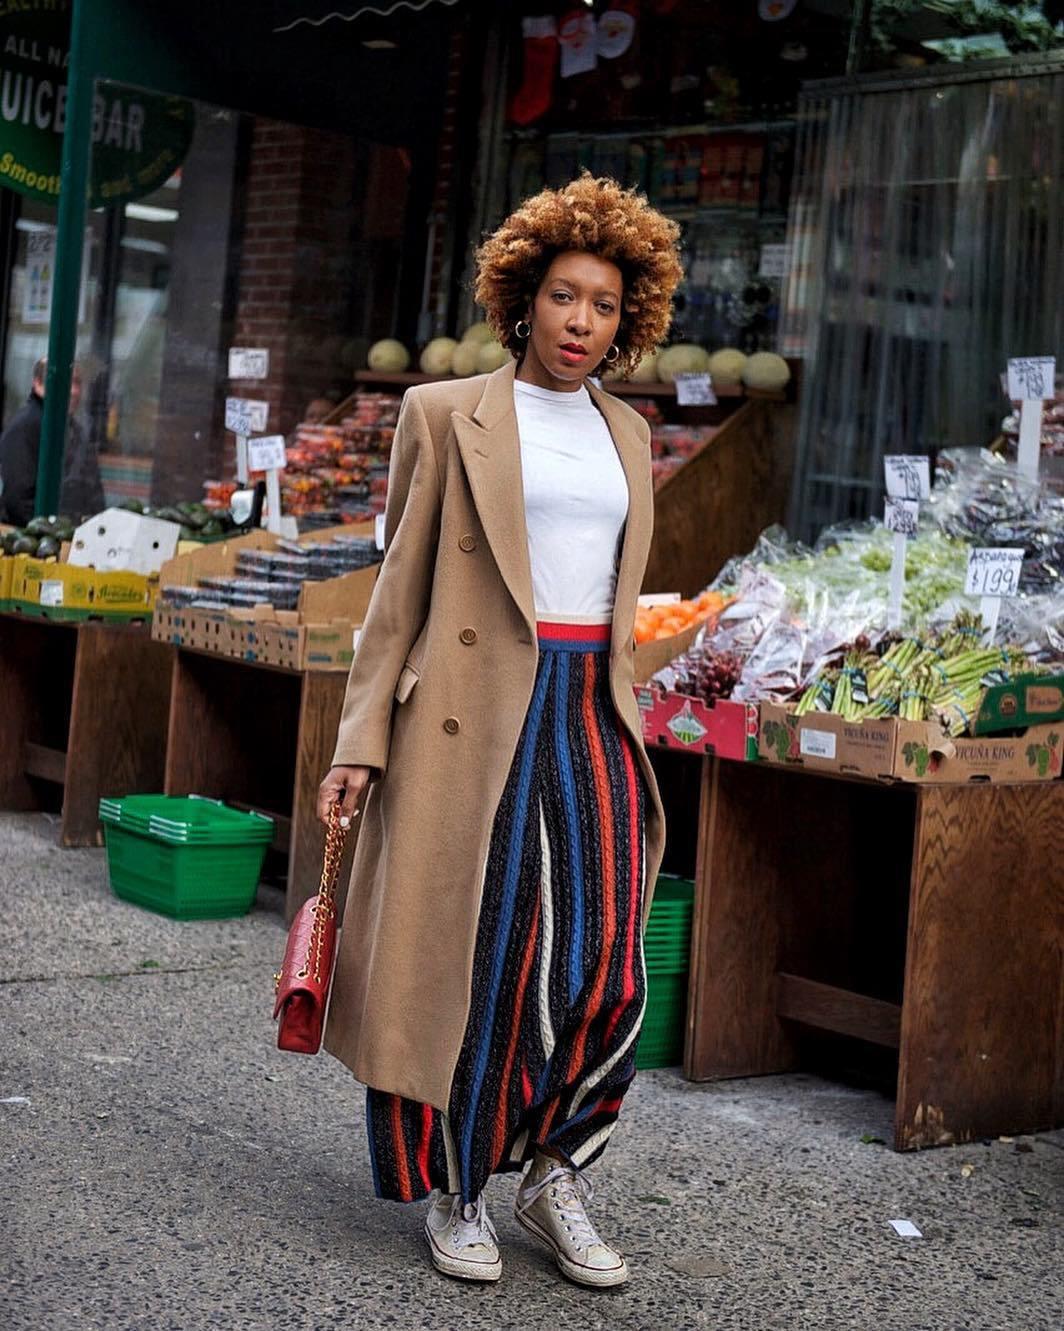 skirt striped skirt midi skirt sneakers converse long coat double breasted beige coat bag white t-shirt